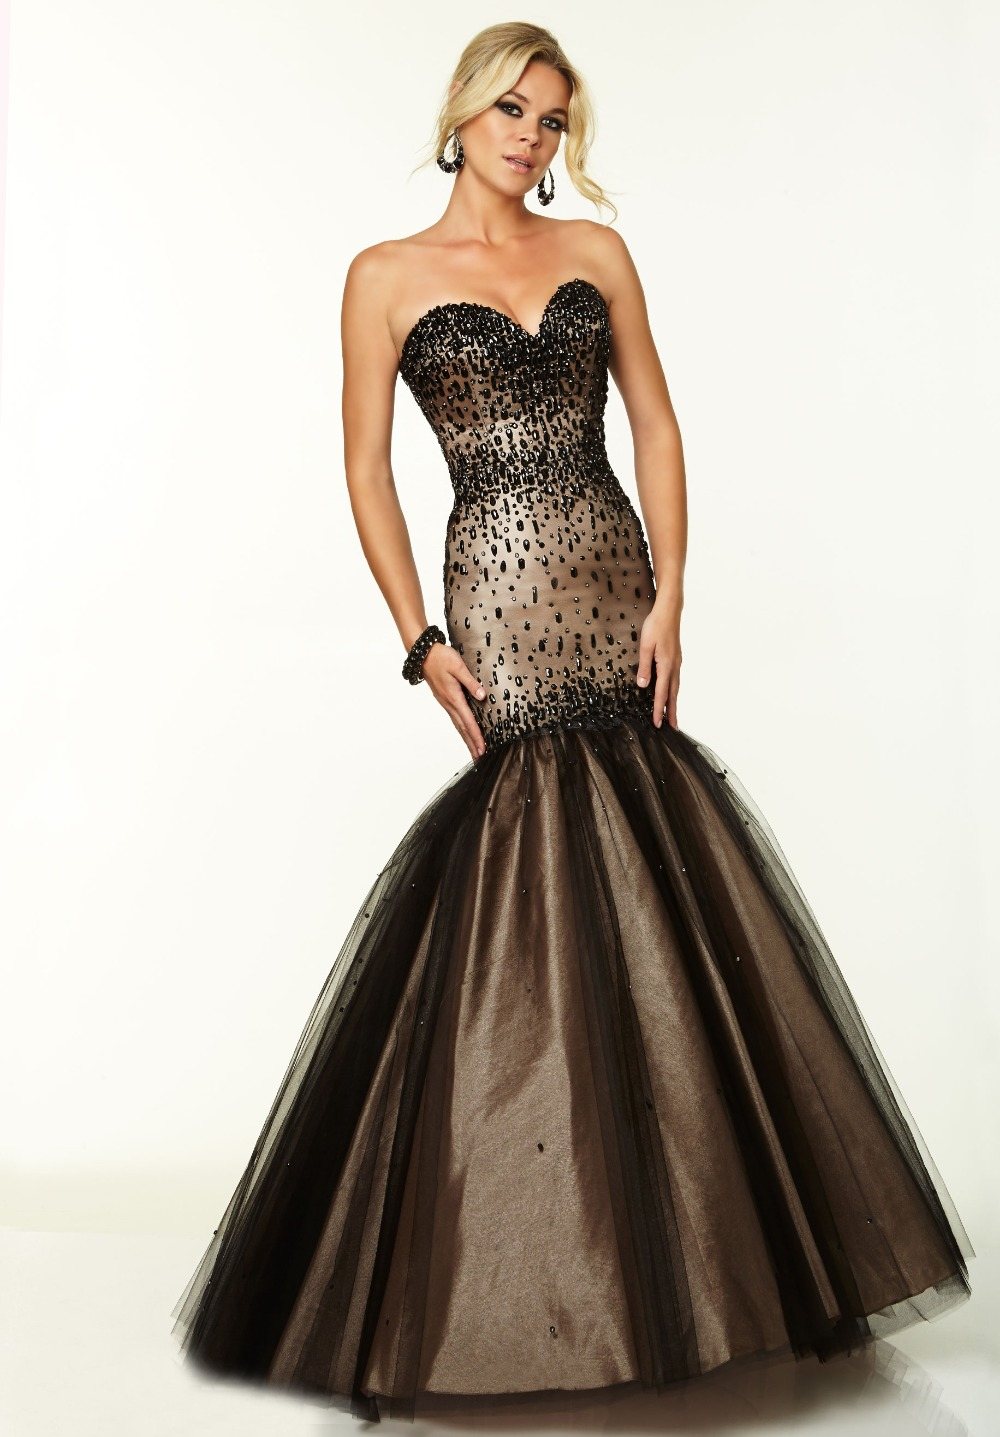 New Strapless Beaded Bodice Black Mermaid Prom Dress-in ...